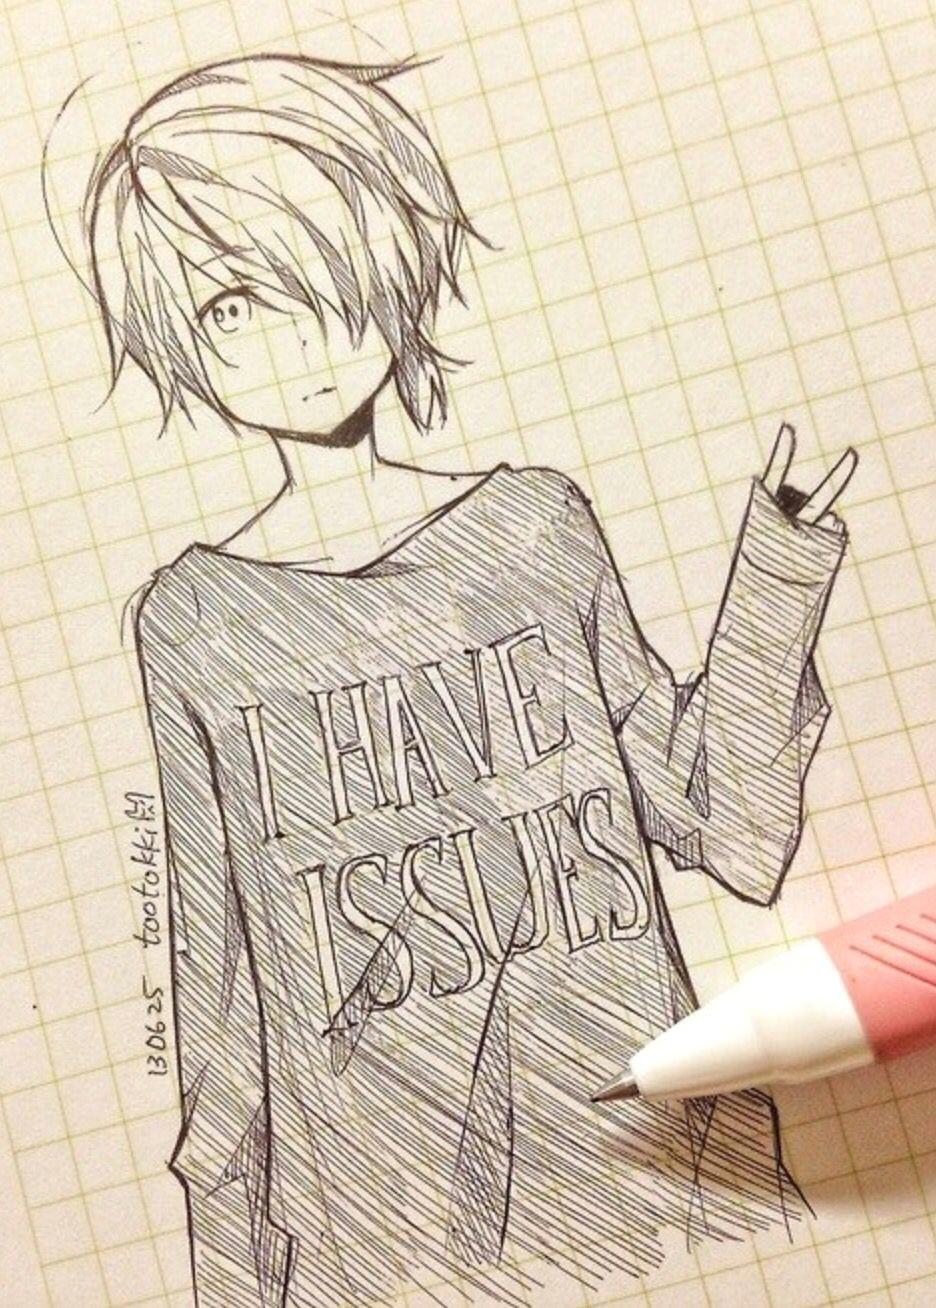 Cartoon Anime Drawings Cute Anime Drawing tootokki I Have issues Sweater Anime